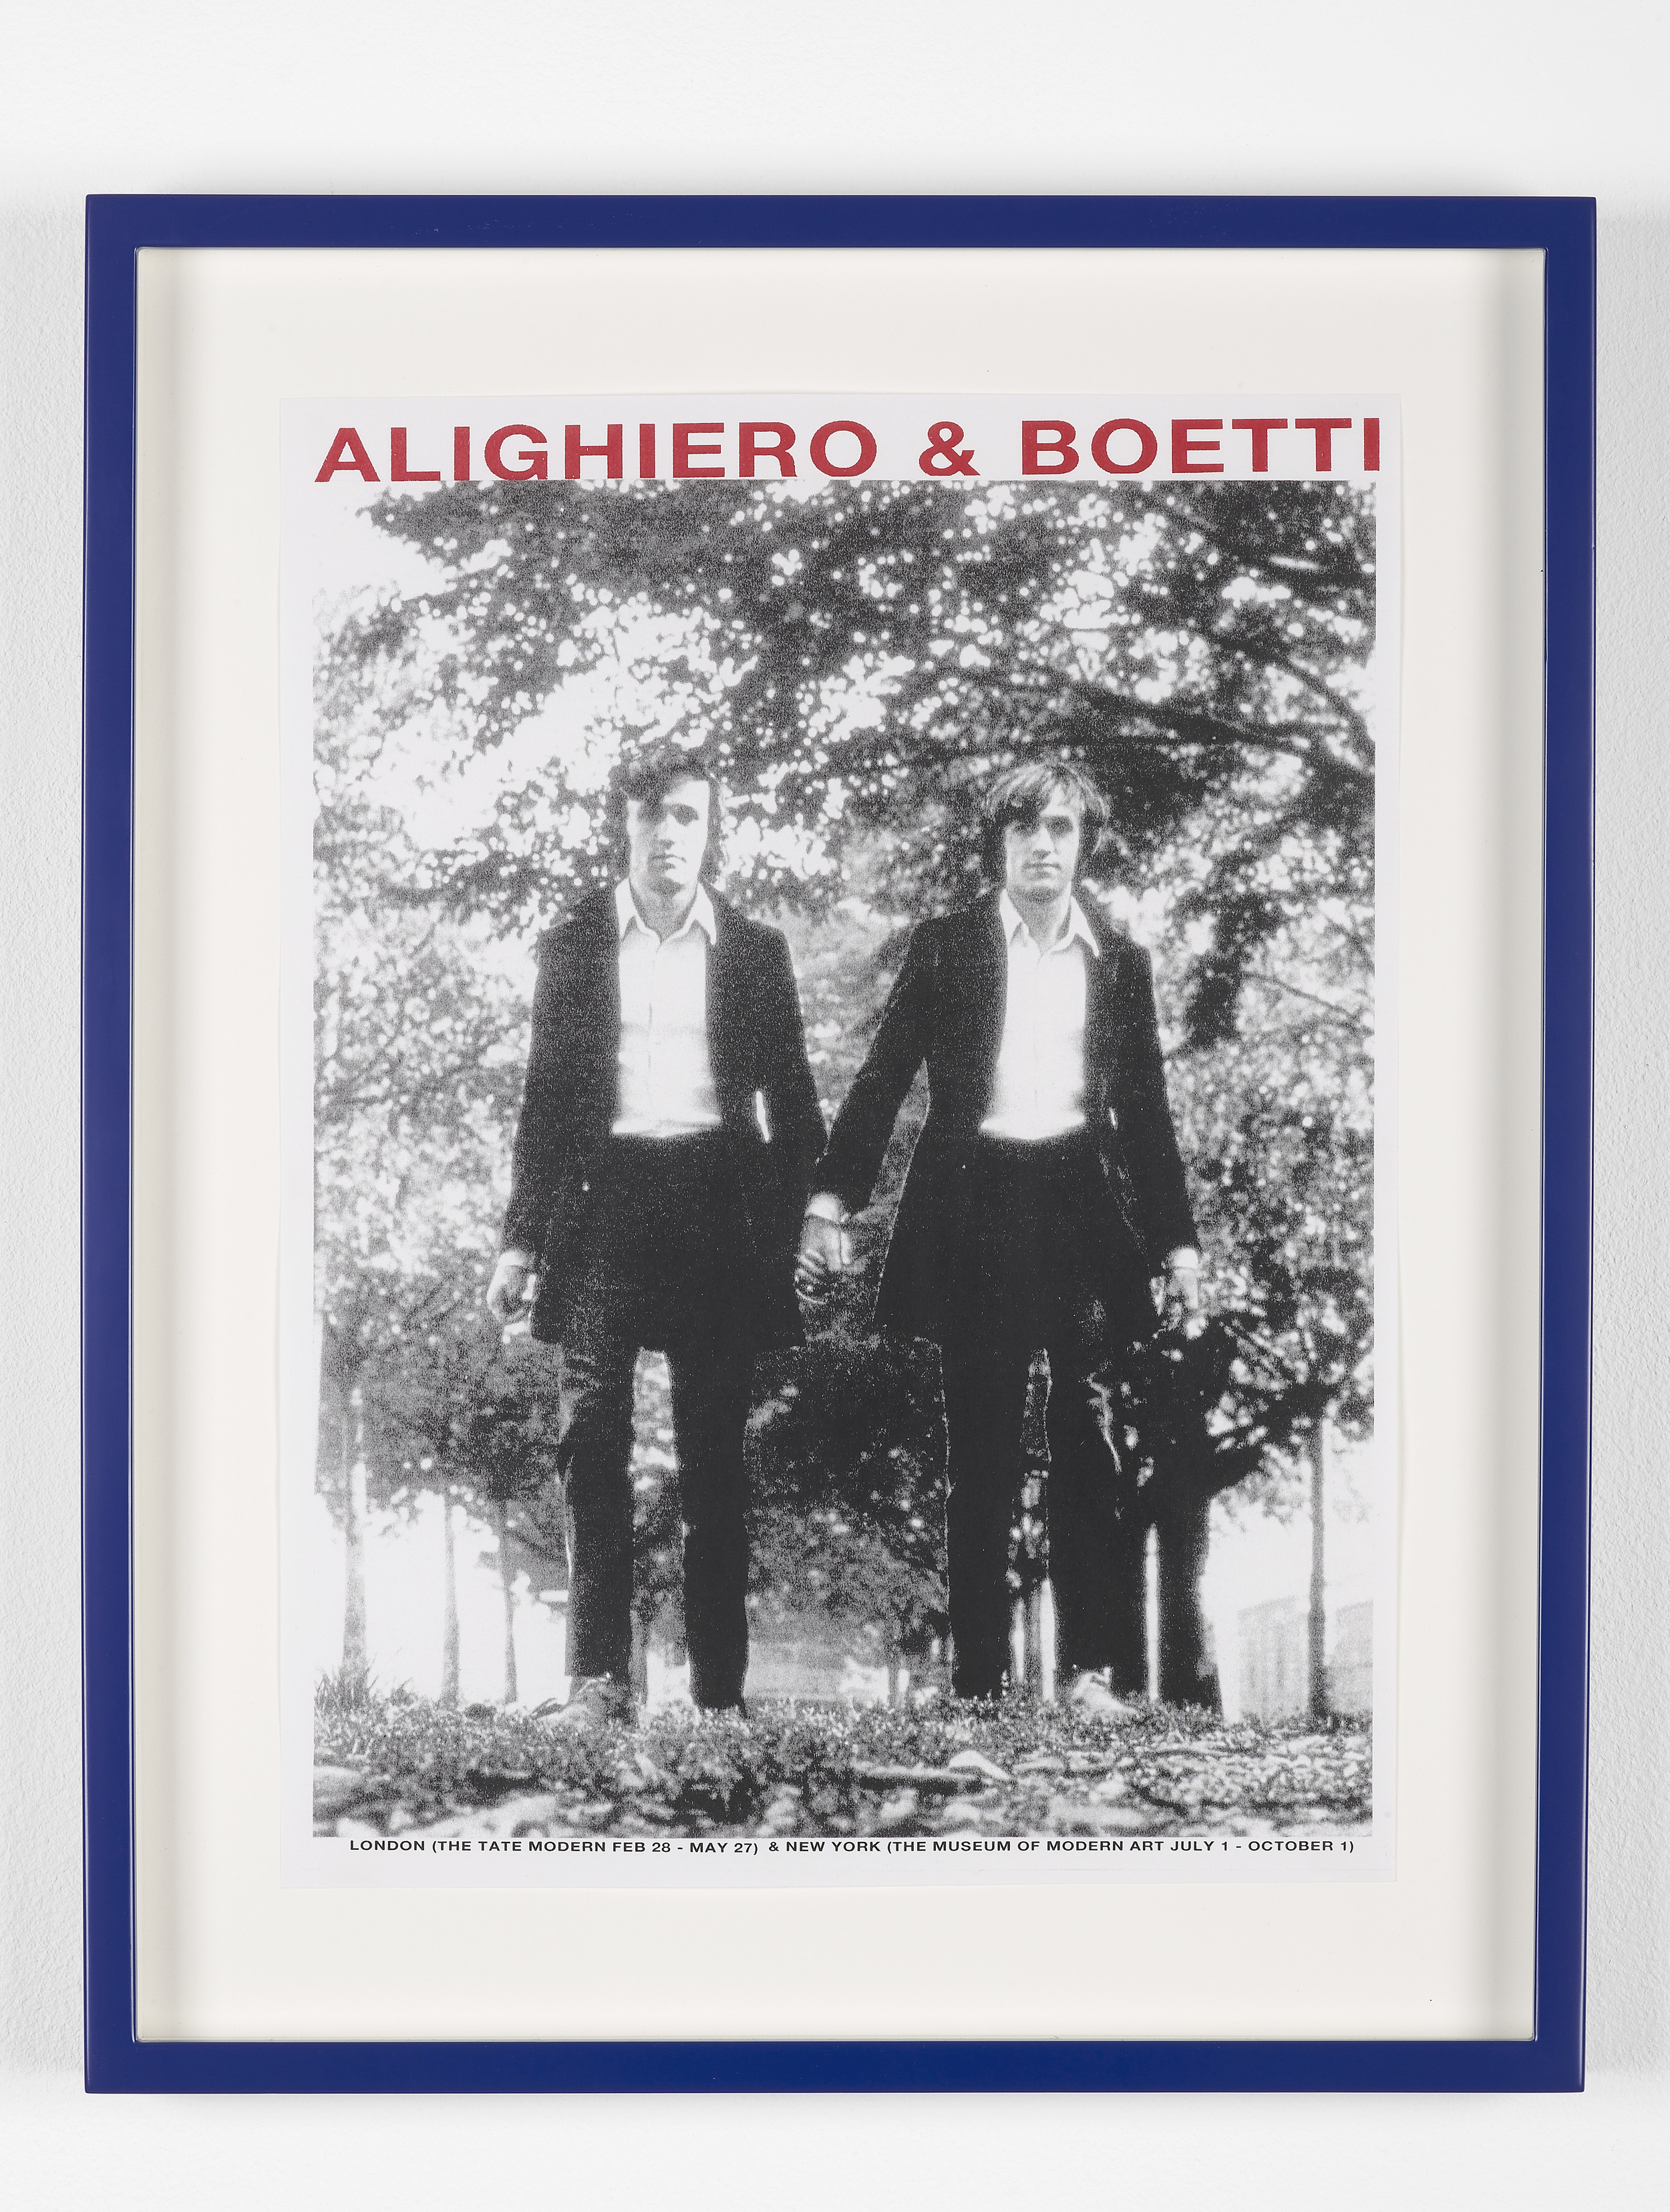 Marc Hundley Alighiero & Boetti 2012 Ink on paper 29.7 x 21 cm / 11.7 x 8.2 in